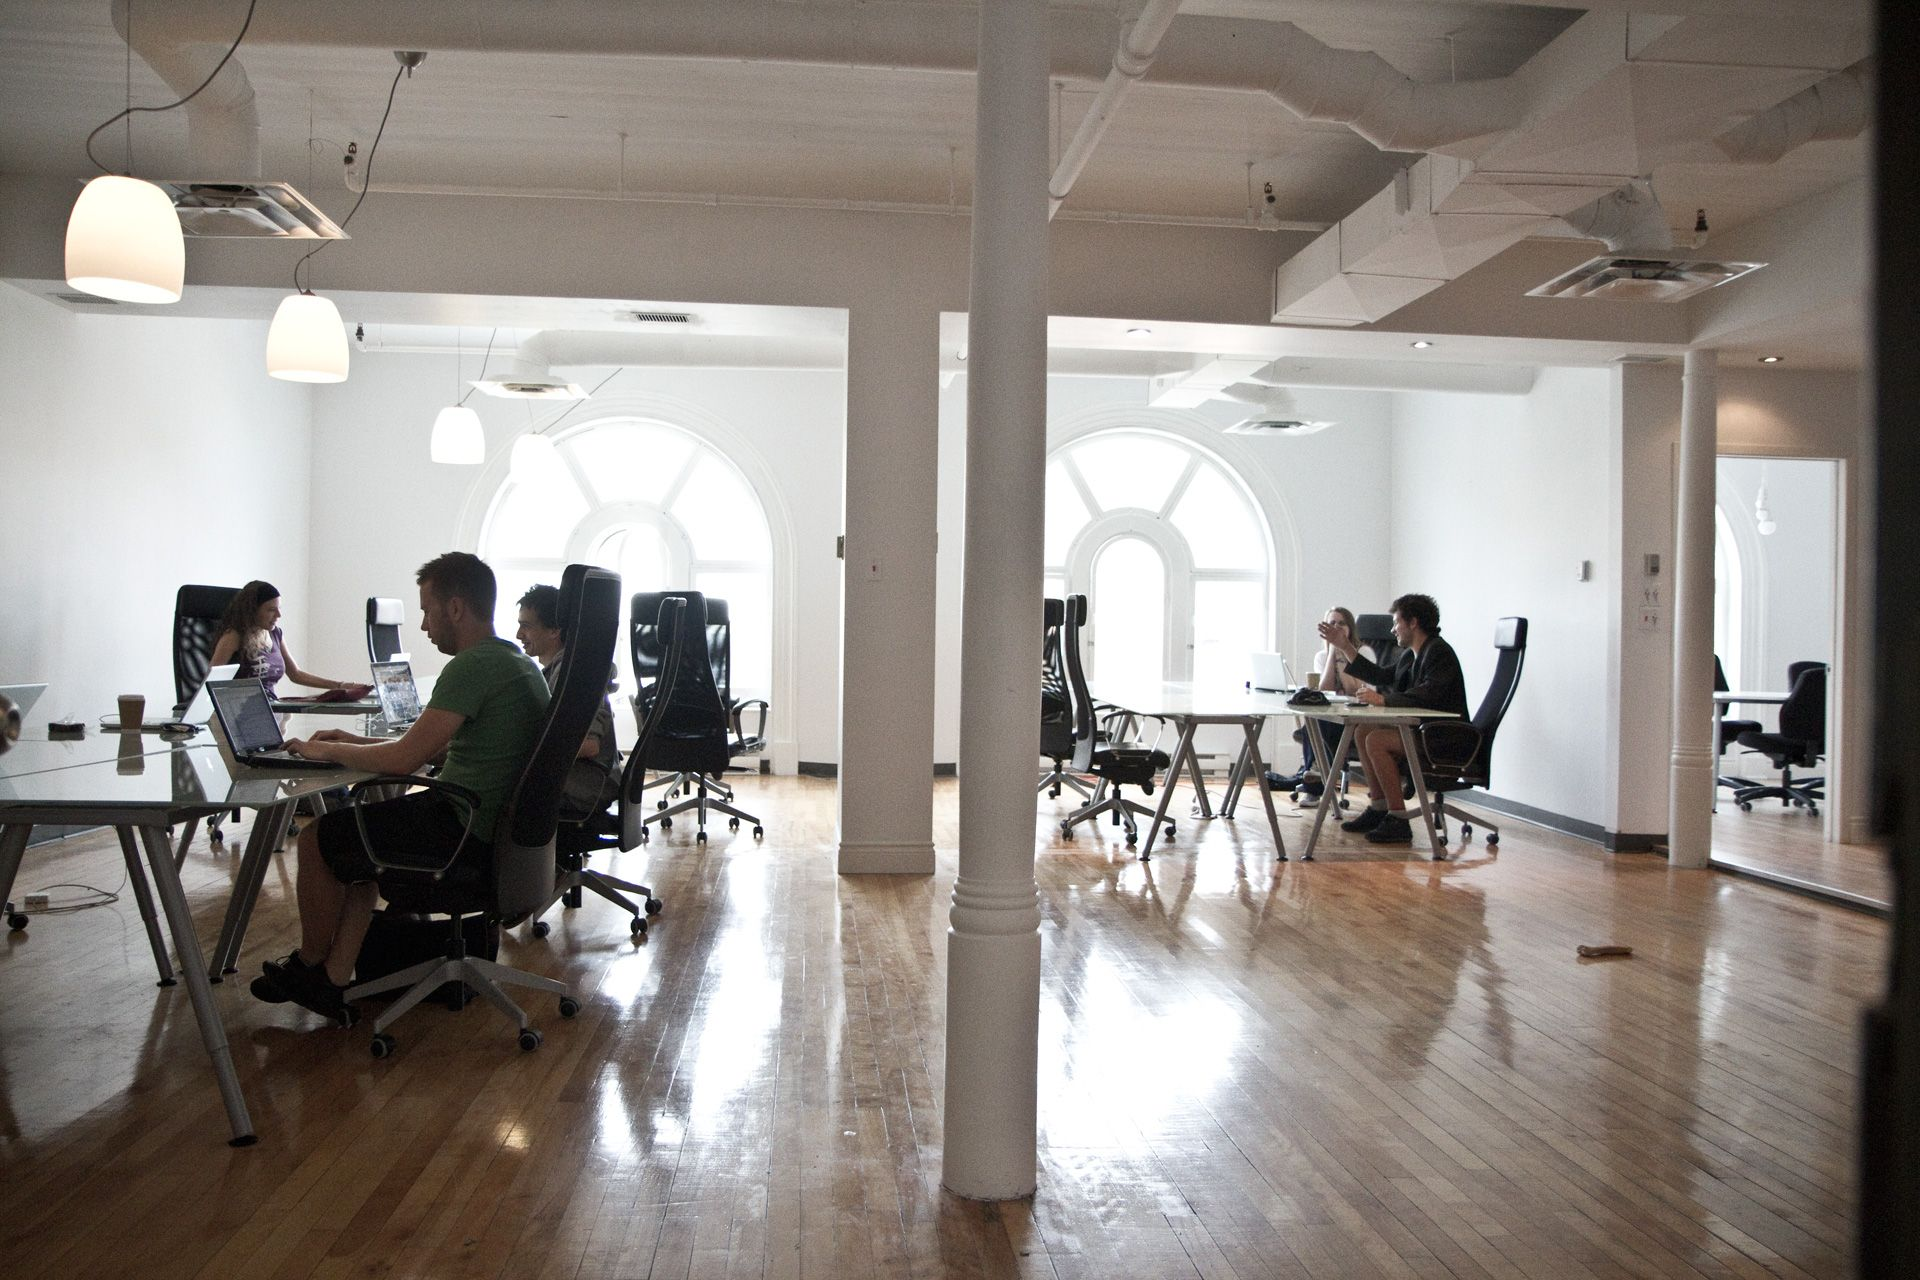 abri co coworking space in qu bec 335 rue saint joseph est bureau 500 5i me tage g1k 3b4. Black Bedroom Furniture Sets. Home Design Ideas